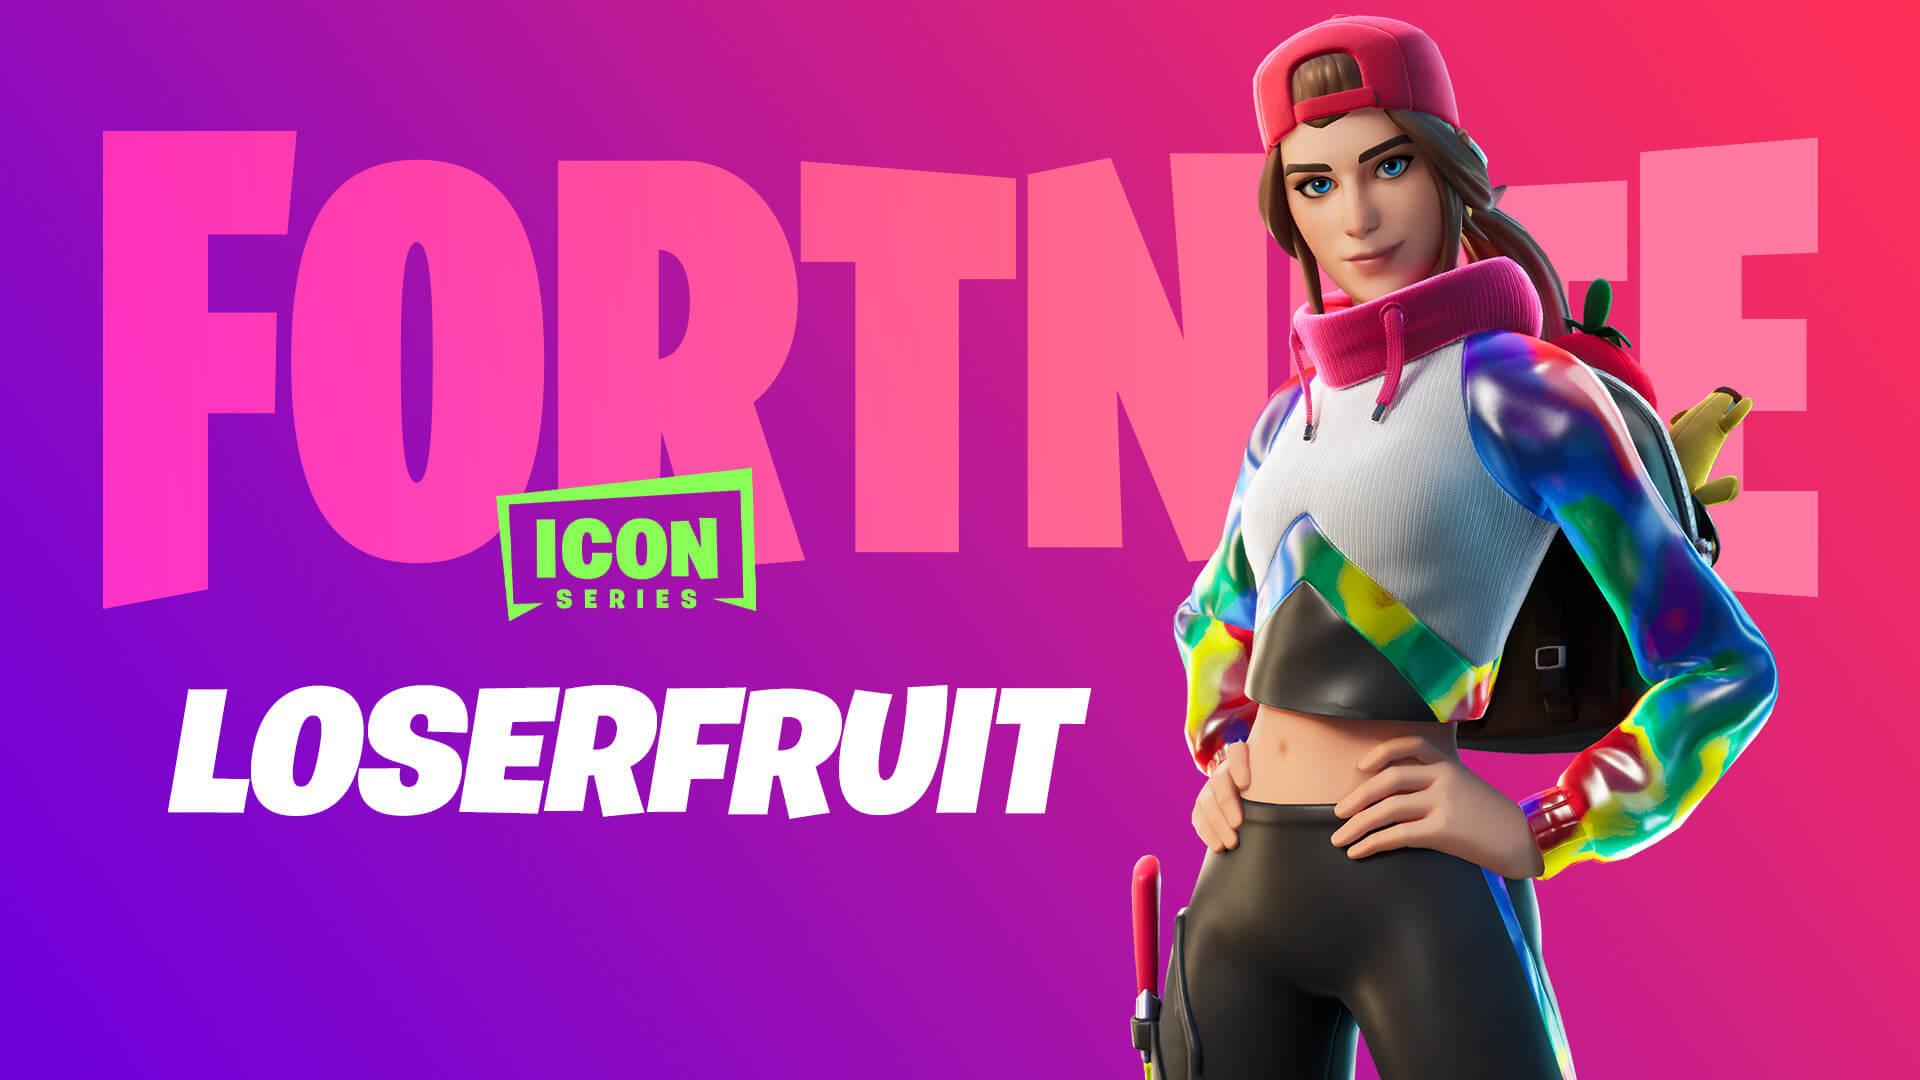 Skin Loser Fruit Fortnite Icon Series